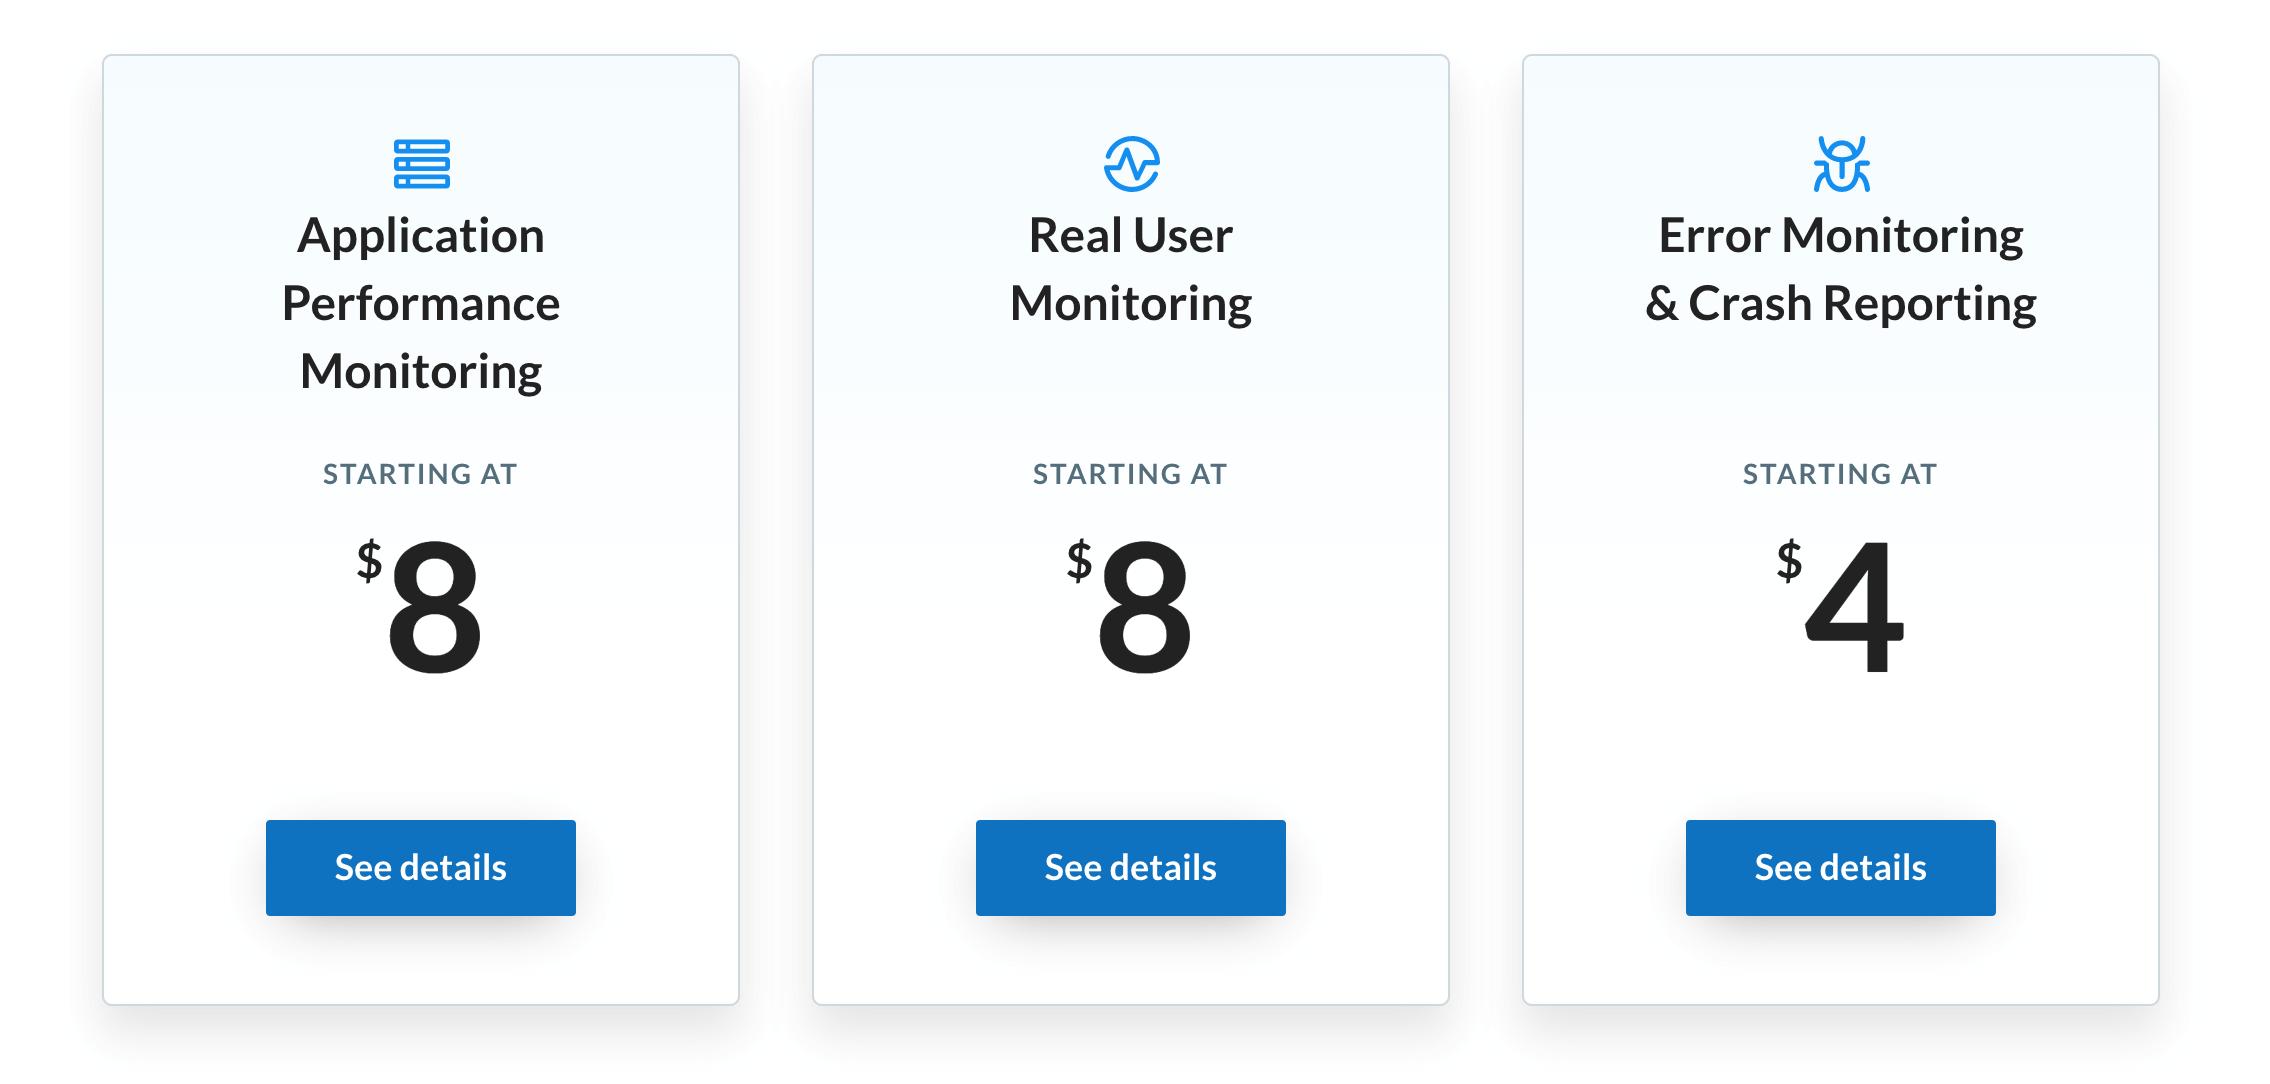 Raygun pricing raygun.com/pricing